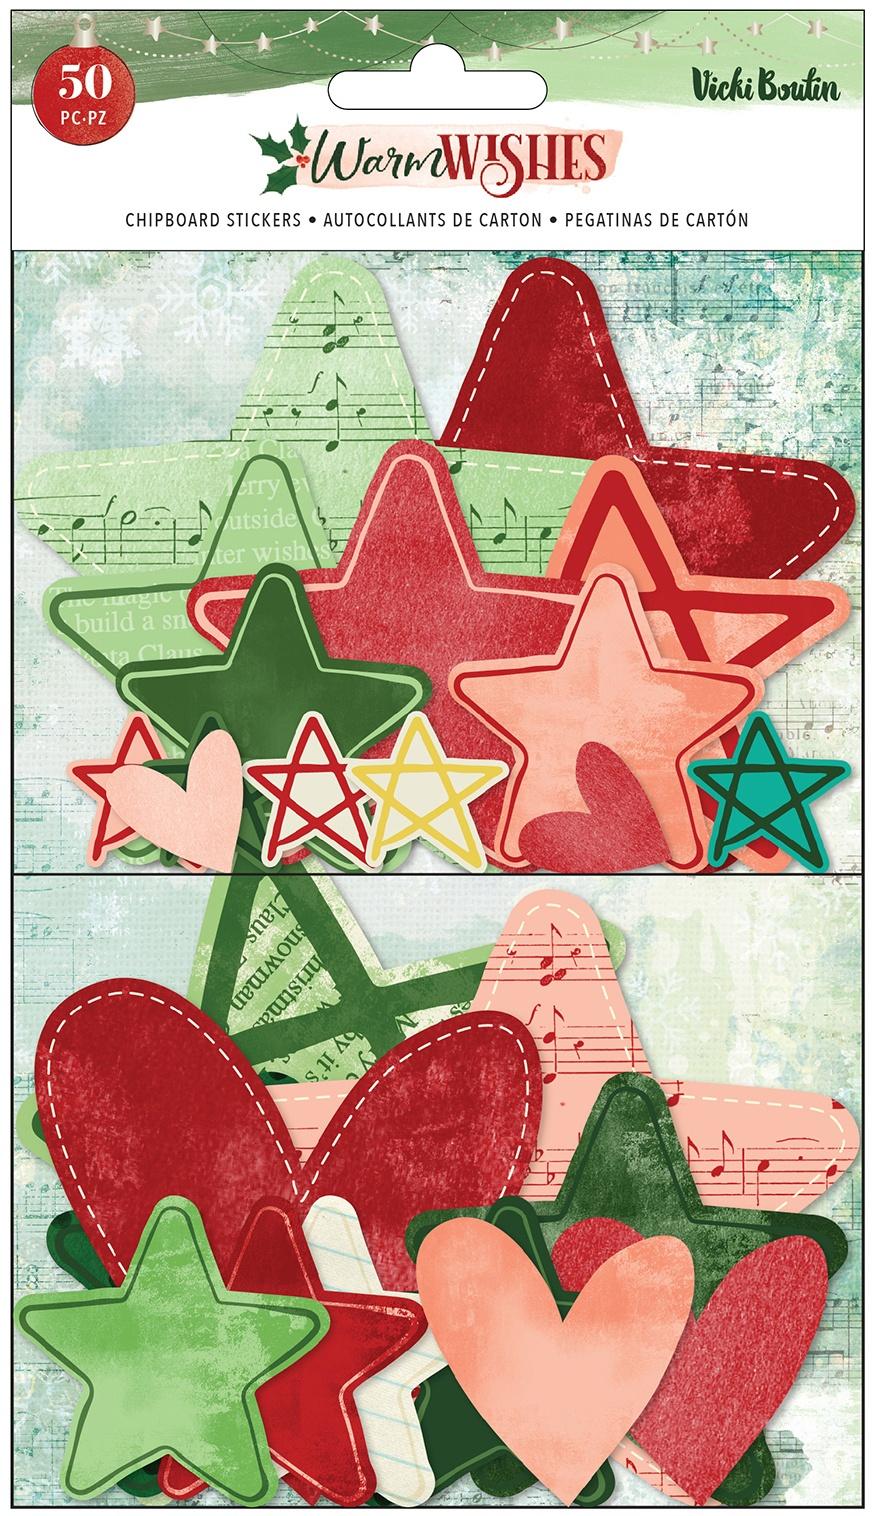 Vicki Boutin - Warm Wishes - Stars and Hearts Chipboard Stickers